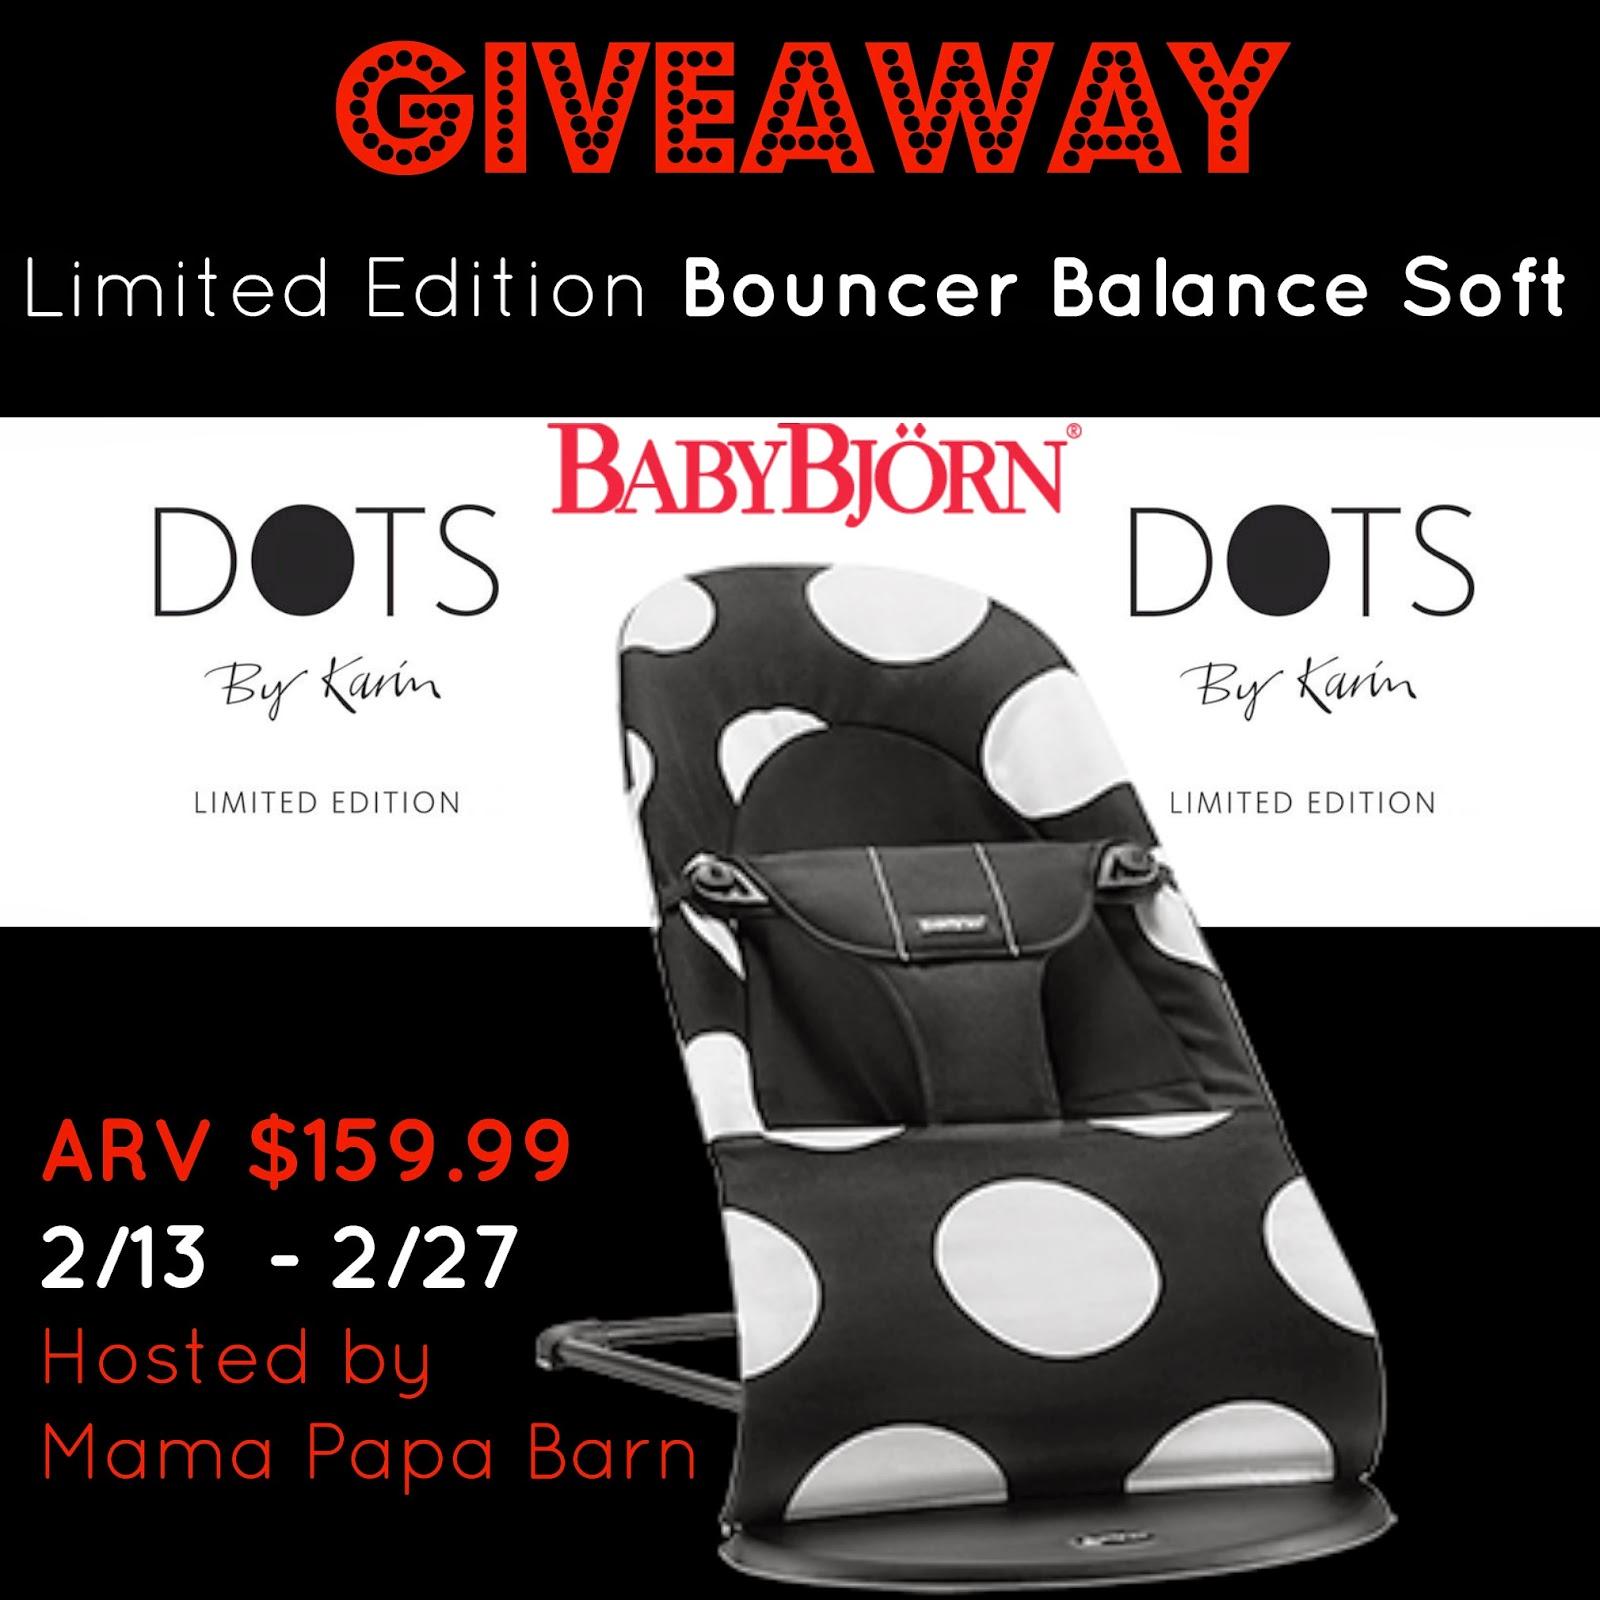 babybjorn bouncer balance soft